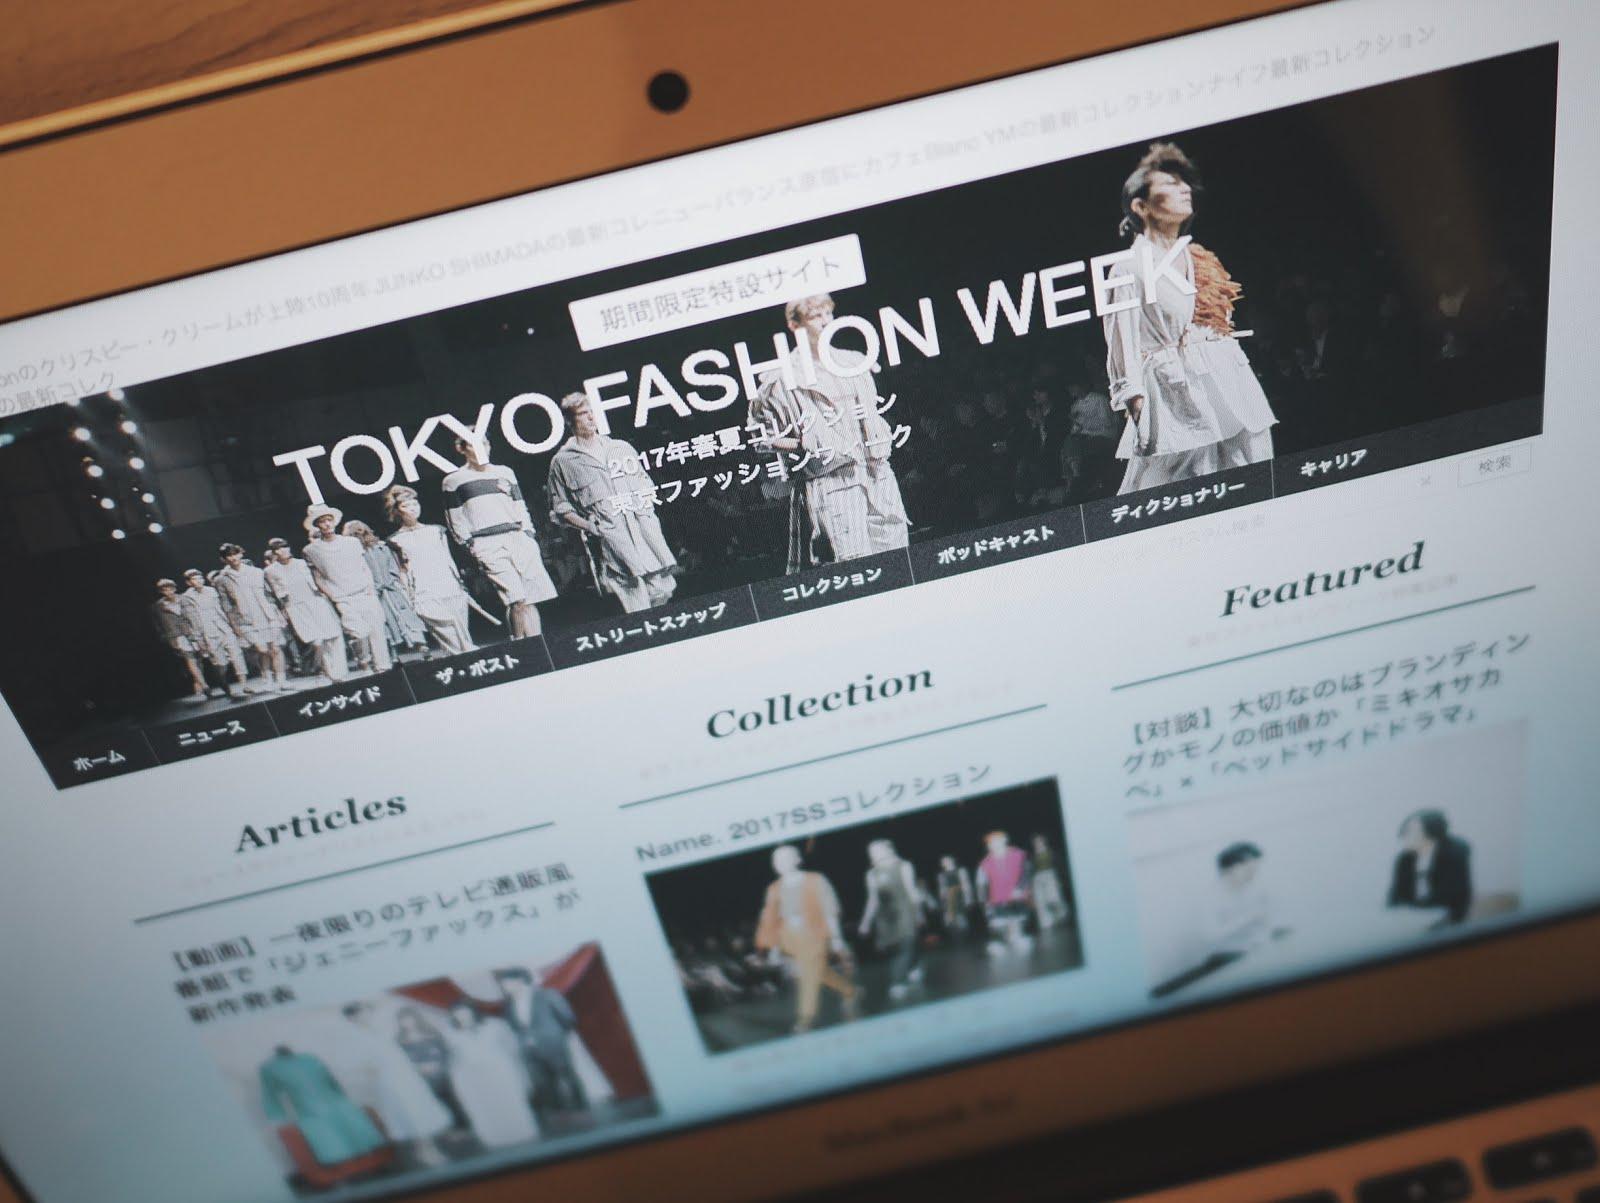 Fashionsnap.com「2017年春夏 東京コレクションウィーク 特設サイト」